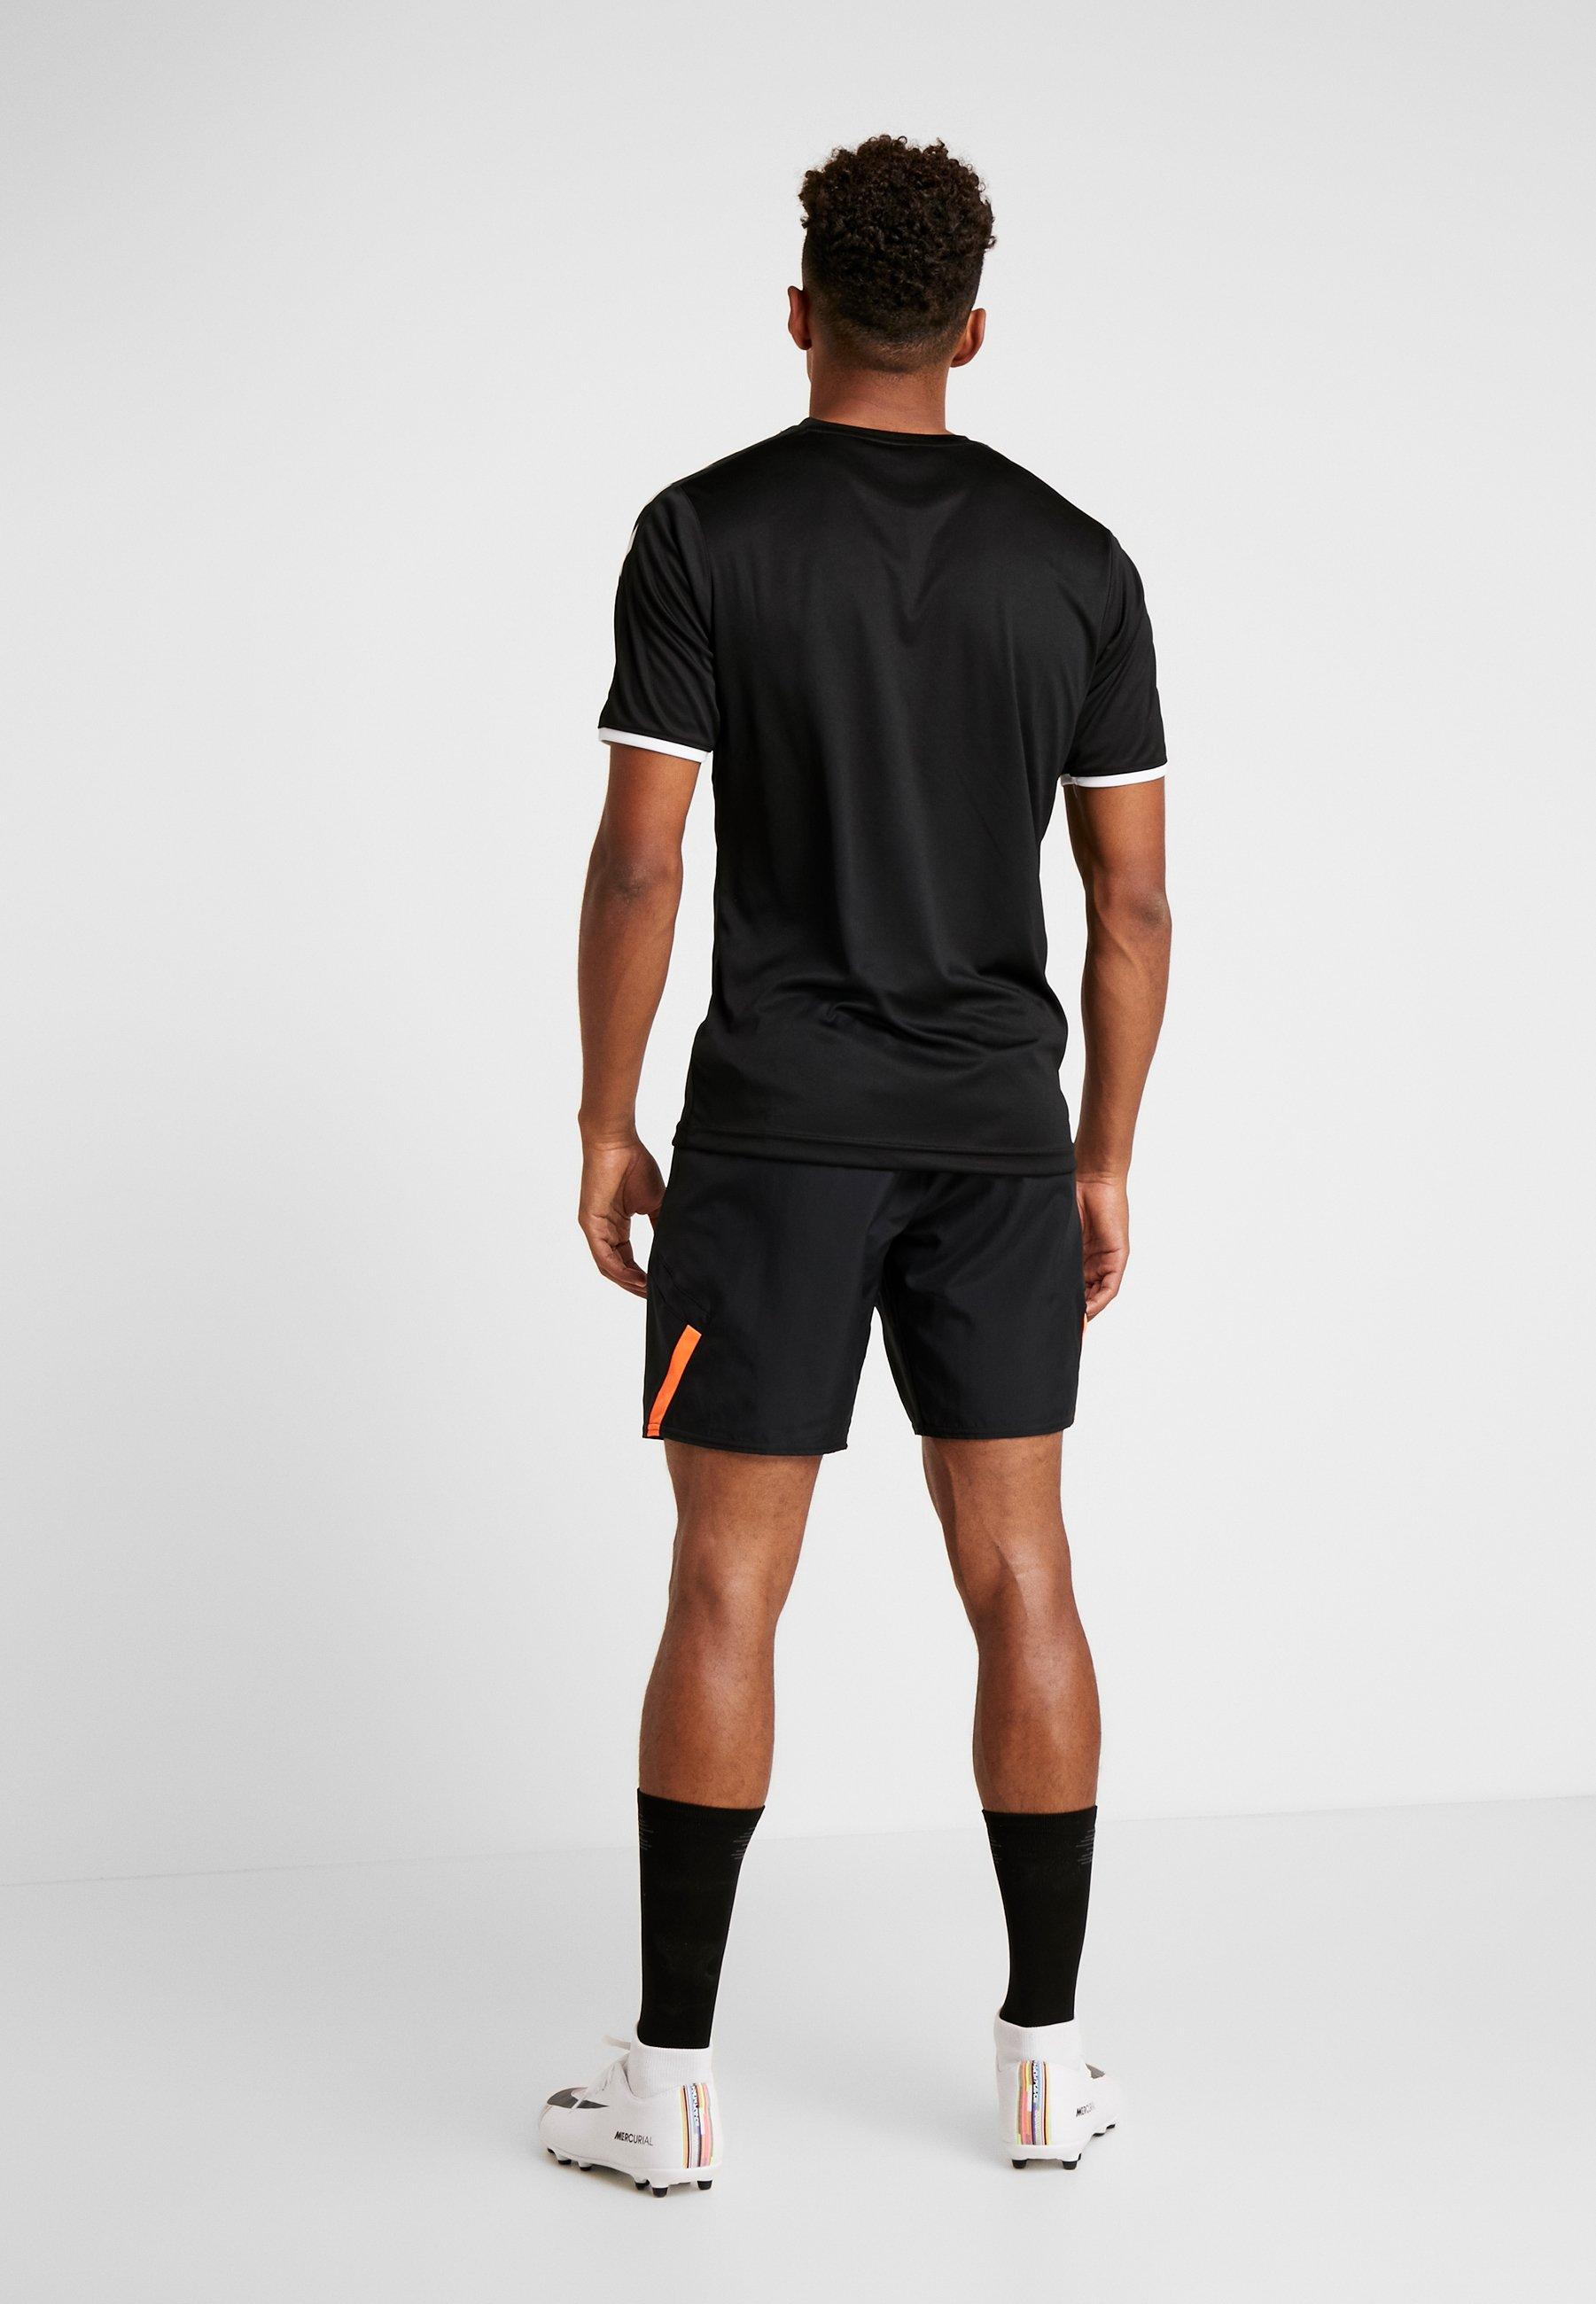 Black shocking Training Sport Eindhoven Psv Umbro ShortDe Orange Qhrdts